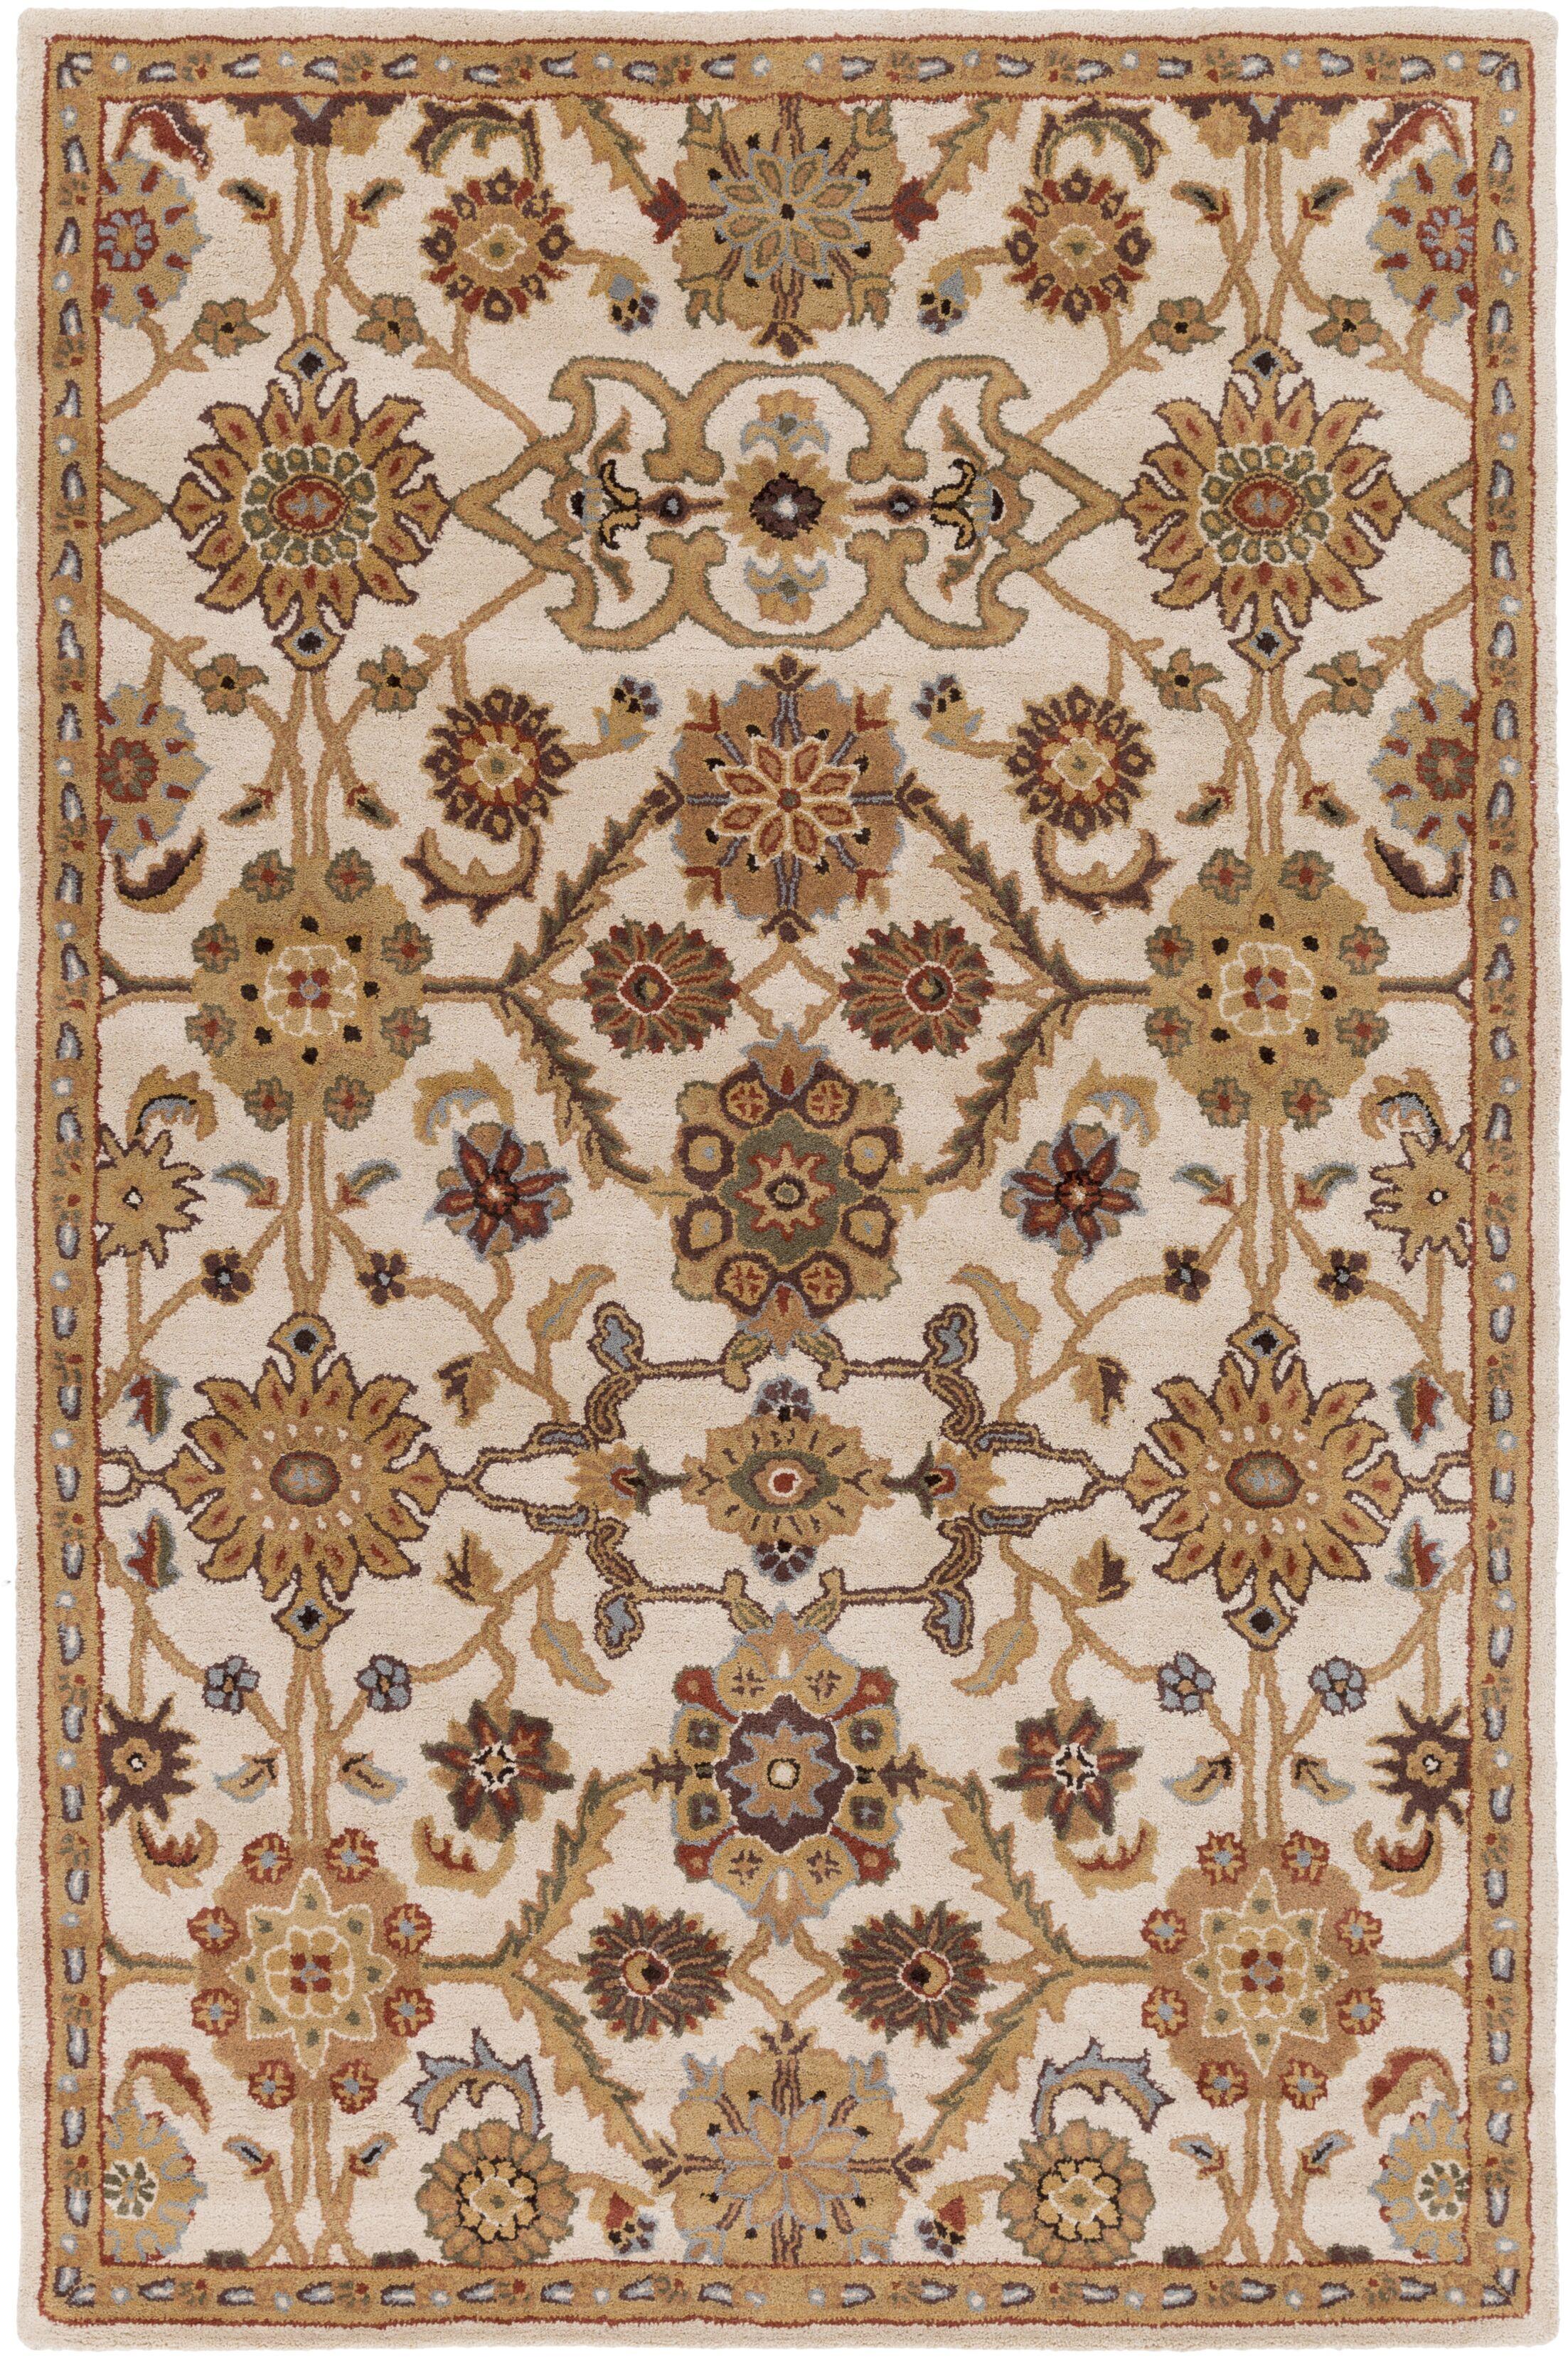 Philson Hand-Tufted Tan/Gray Area Rug Rug Size: Rectangle 4' x 6'